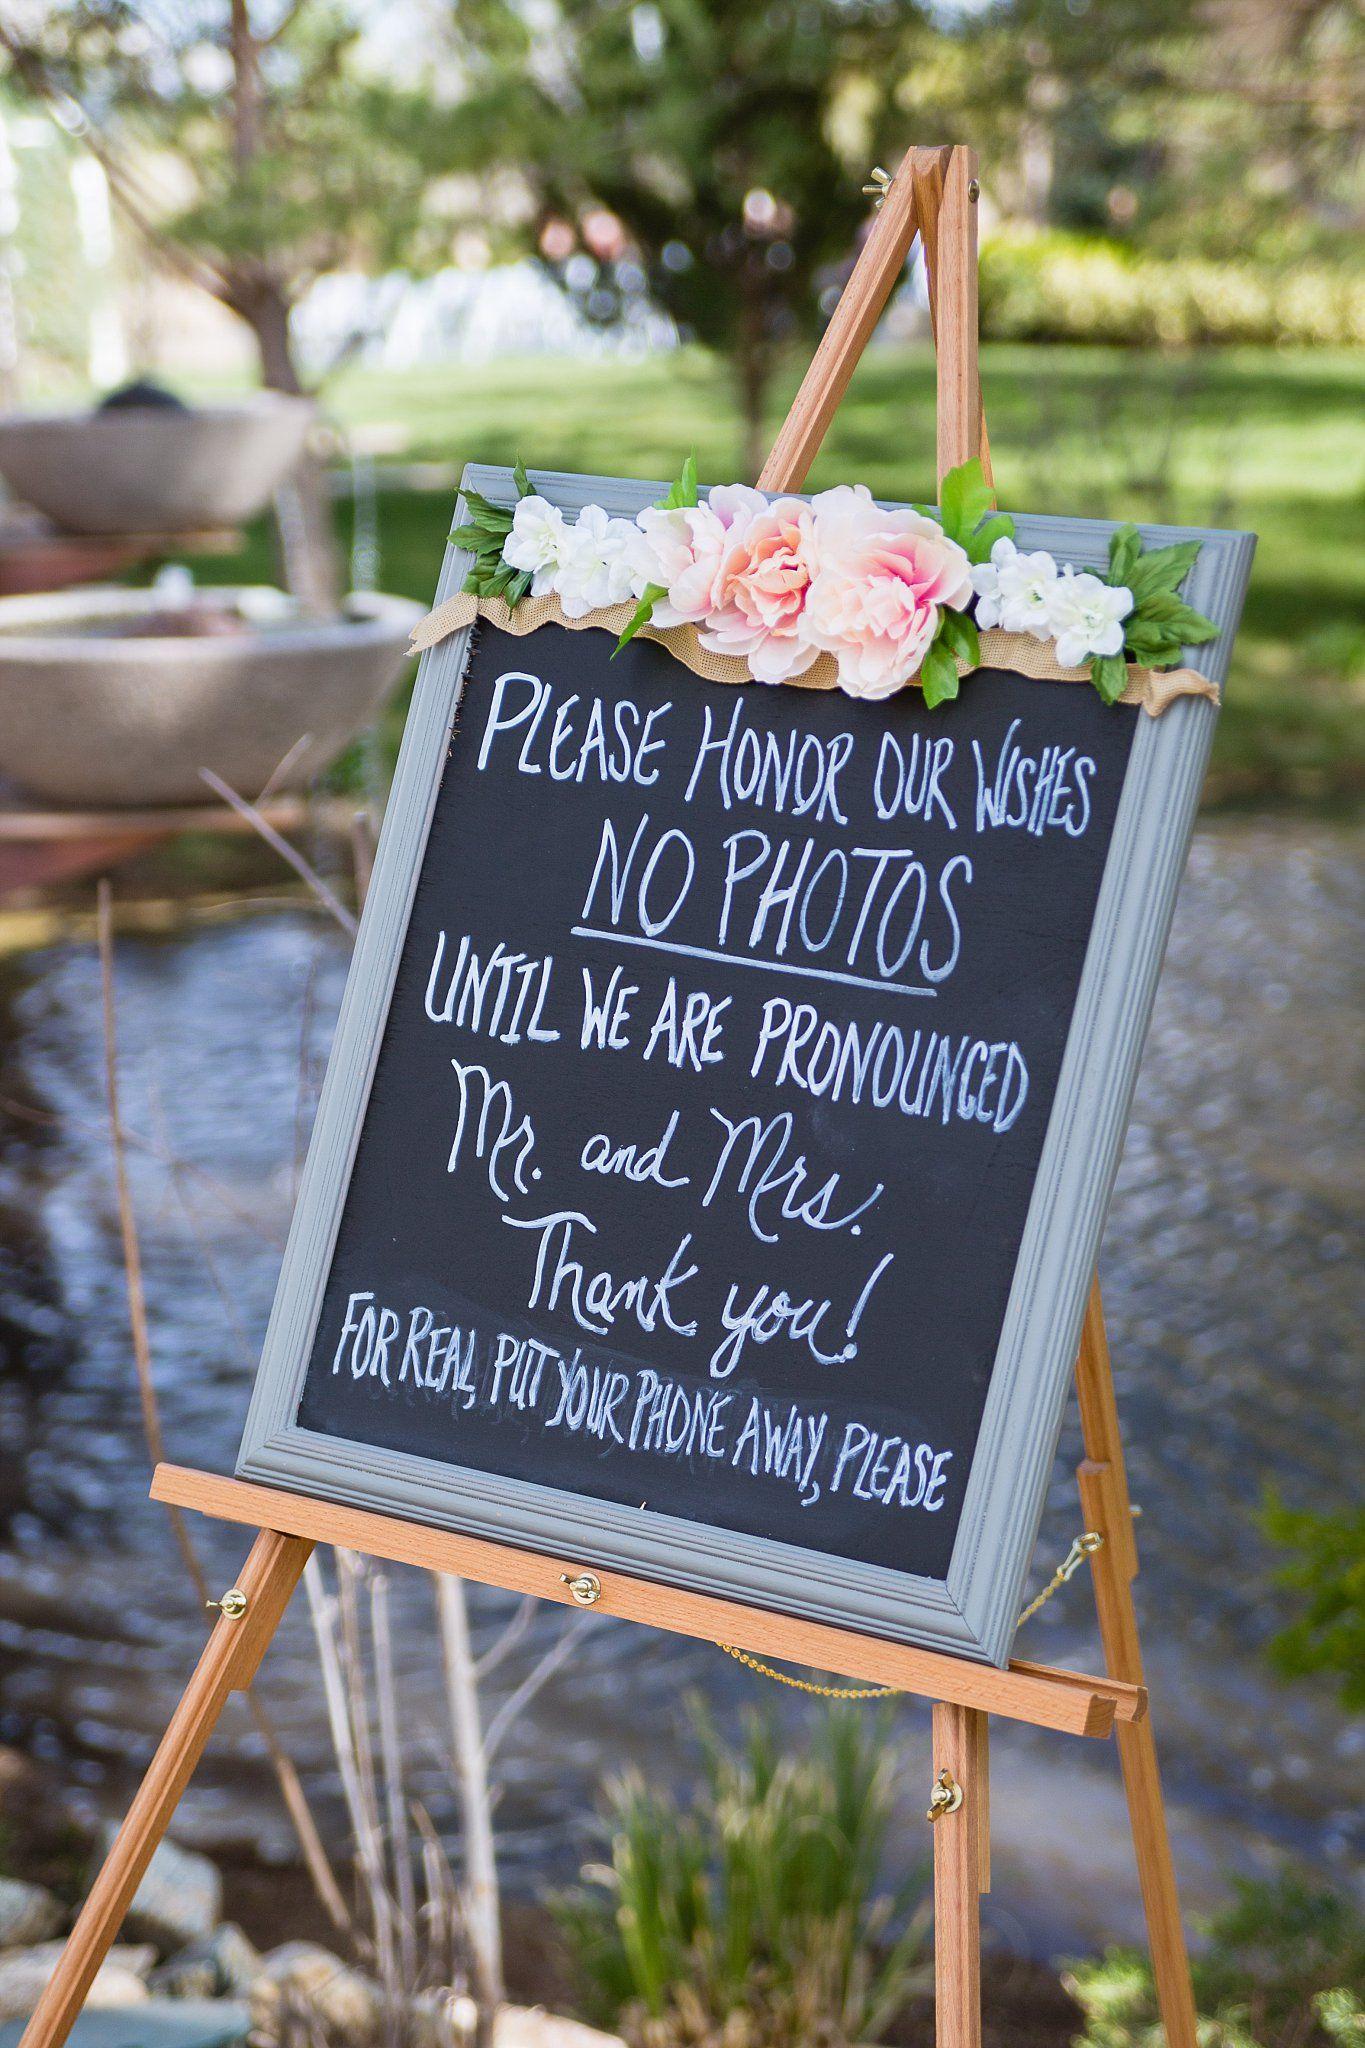 Brianna & Branden Wedding at Windmill House in Chino Valley, Arizona   PMA Photography